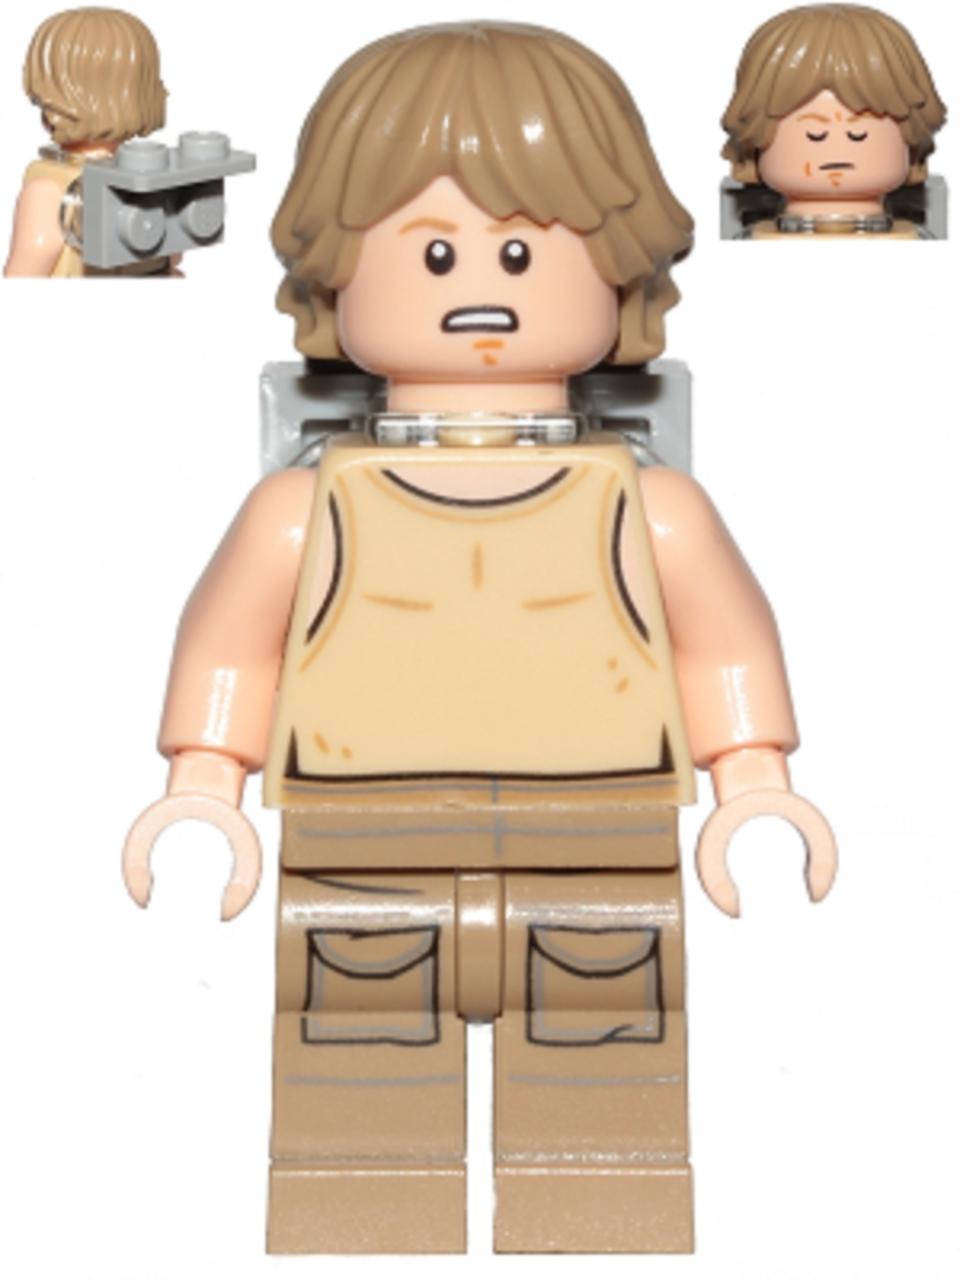 Lego Star Wars Luke Skywalker Dagobah From 75208 The Brick People